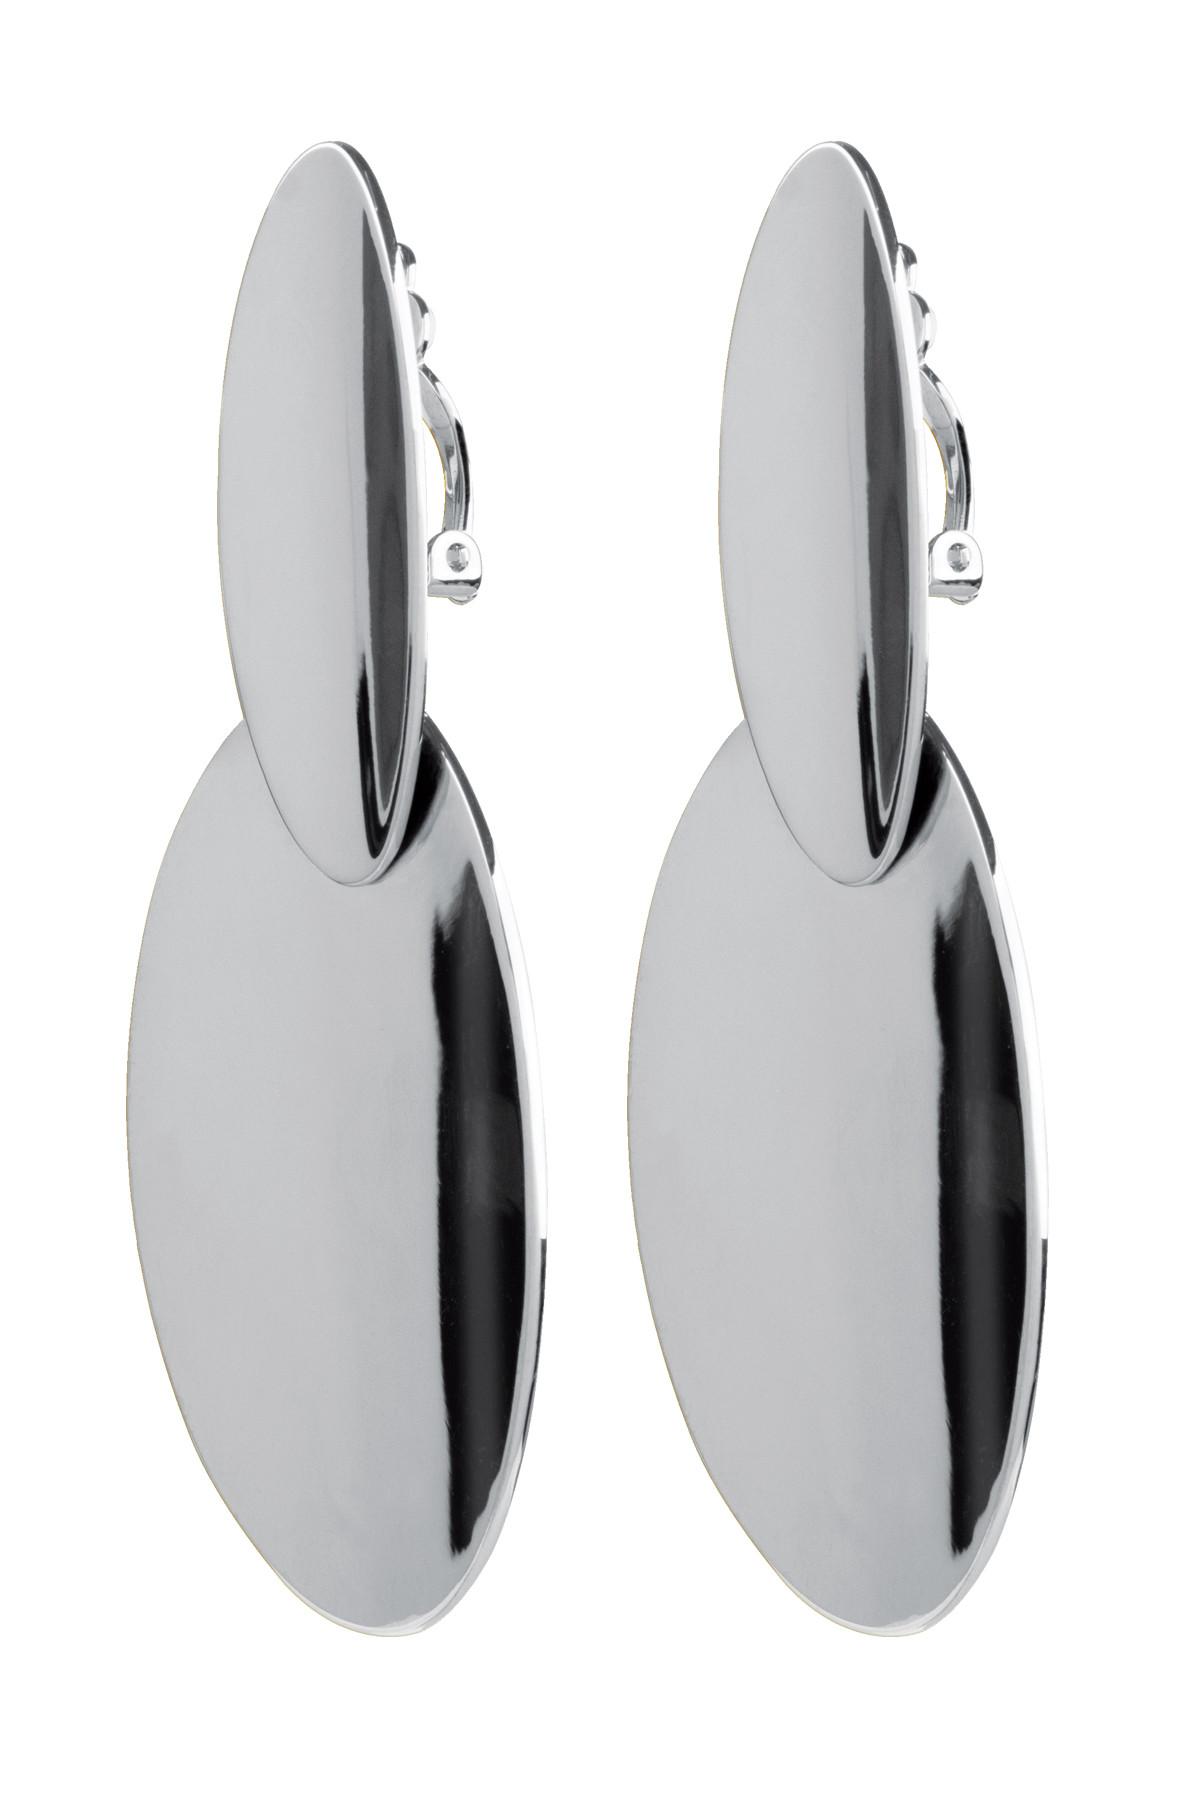 DYRBERG/KERN RIYA EARPOST 350937 (Silver, ONESIZE)